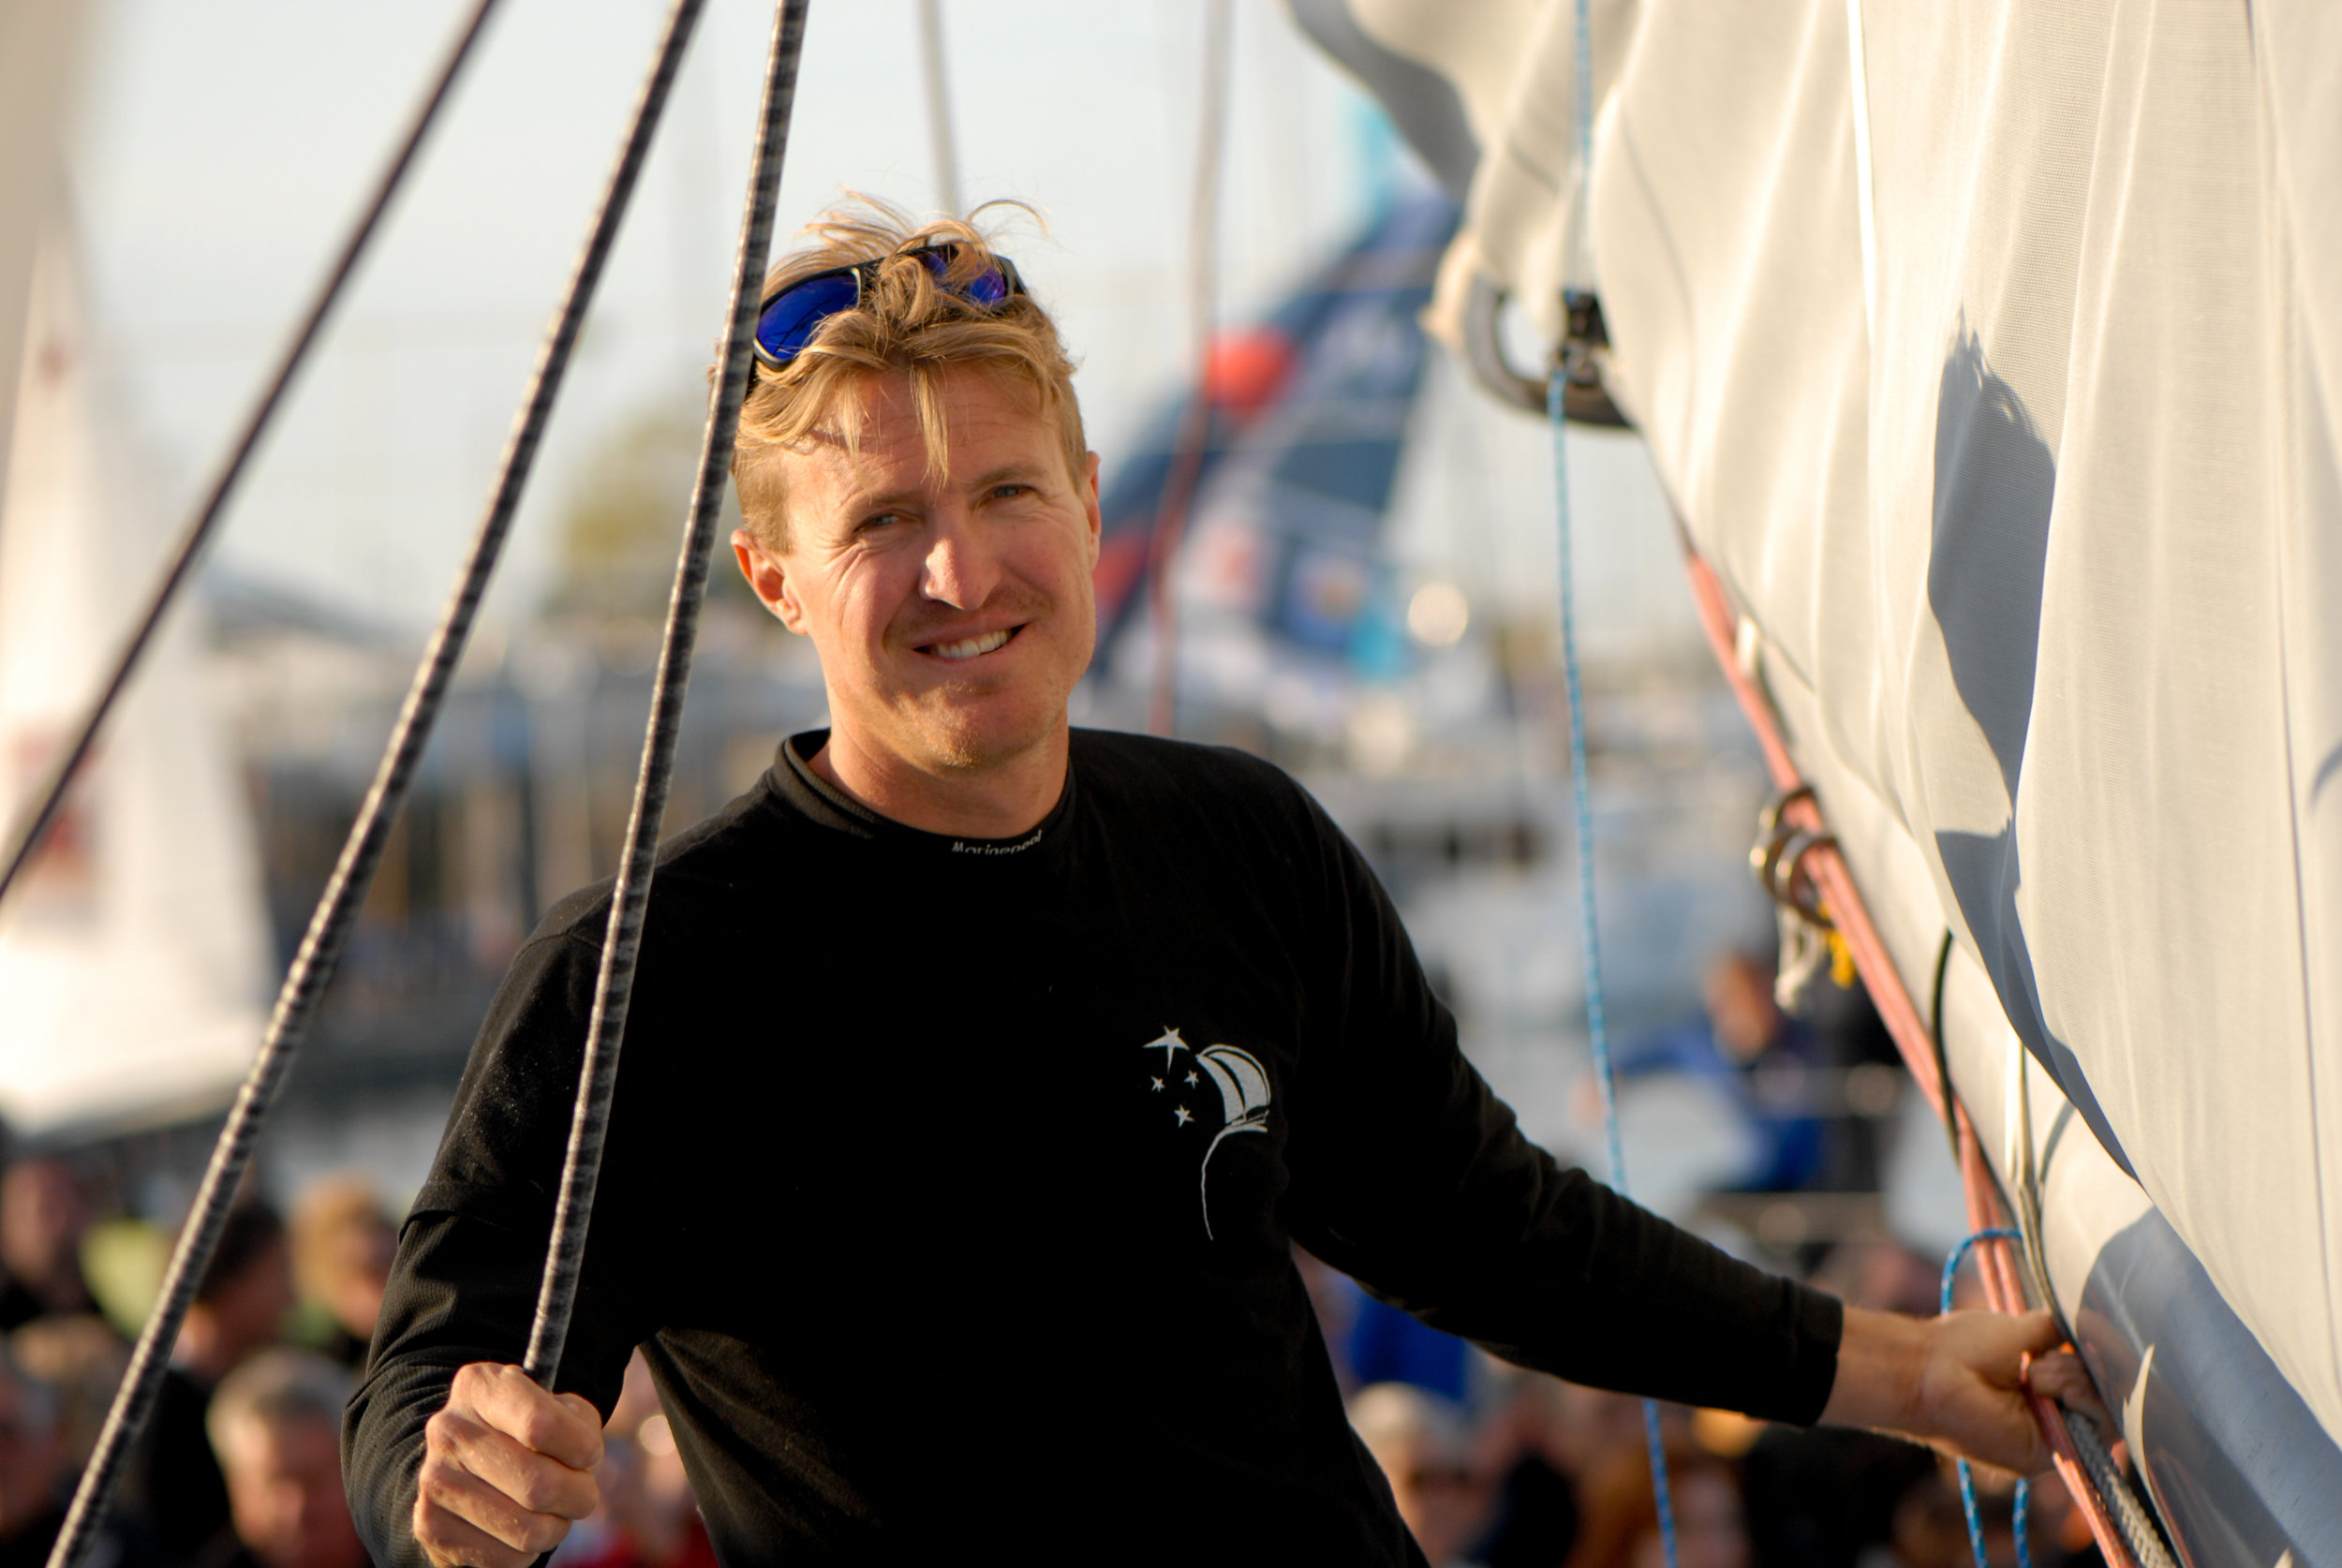 Jay at the Vendee Globe Village as part of  Conrad Colman Ocean Racing  team